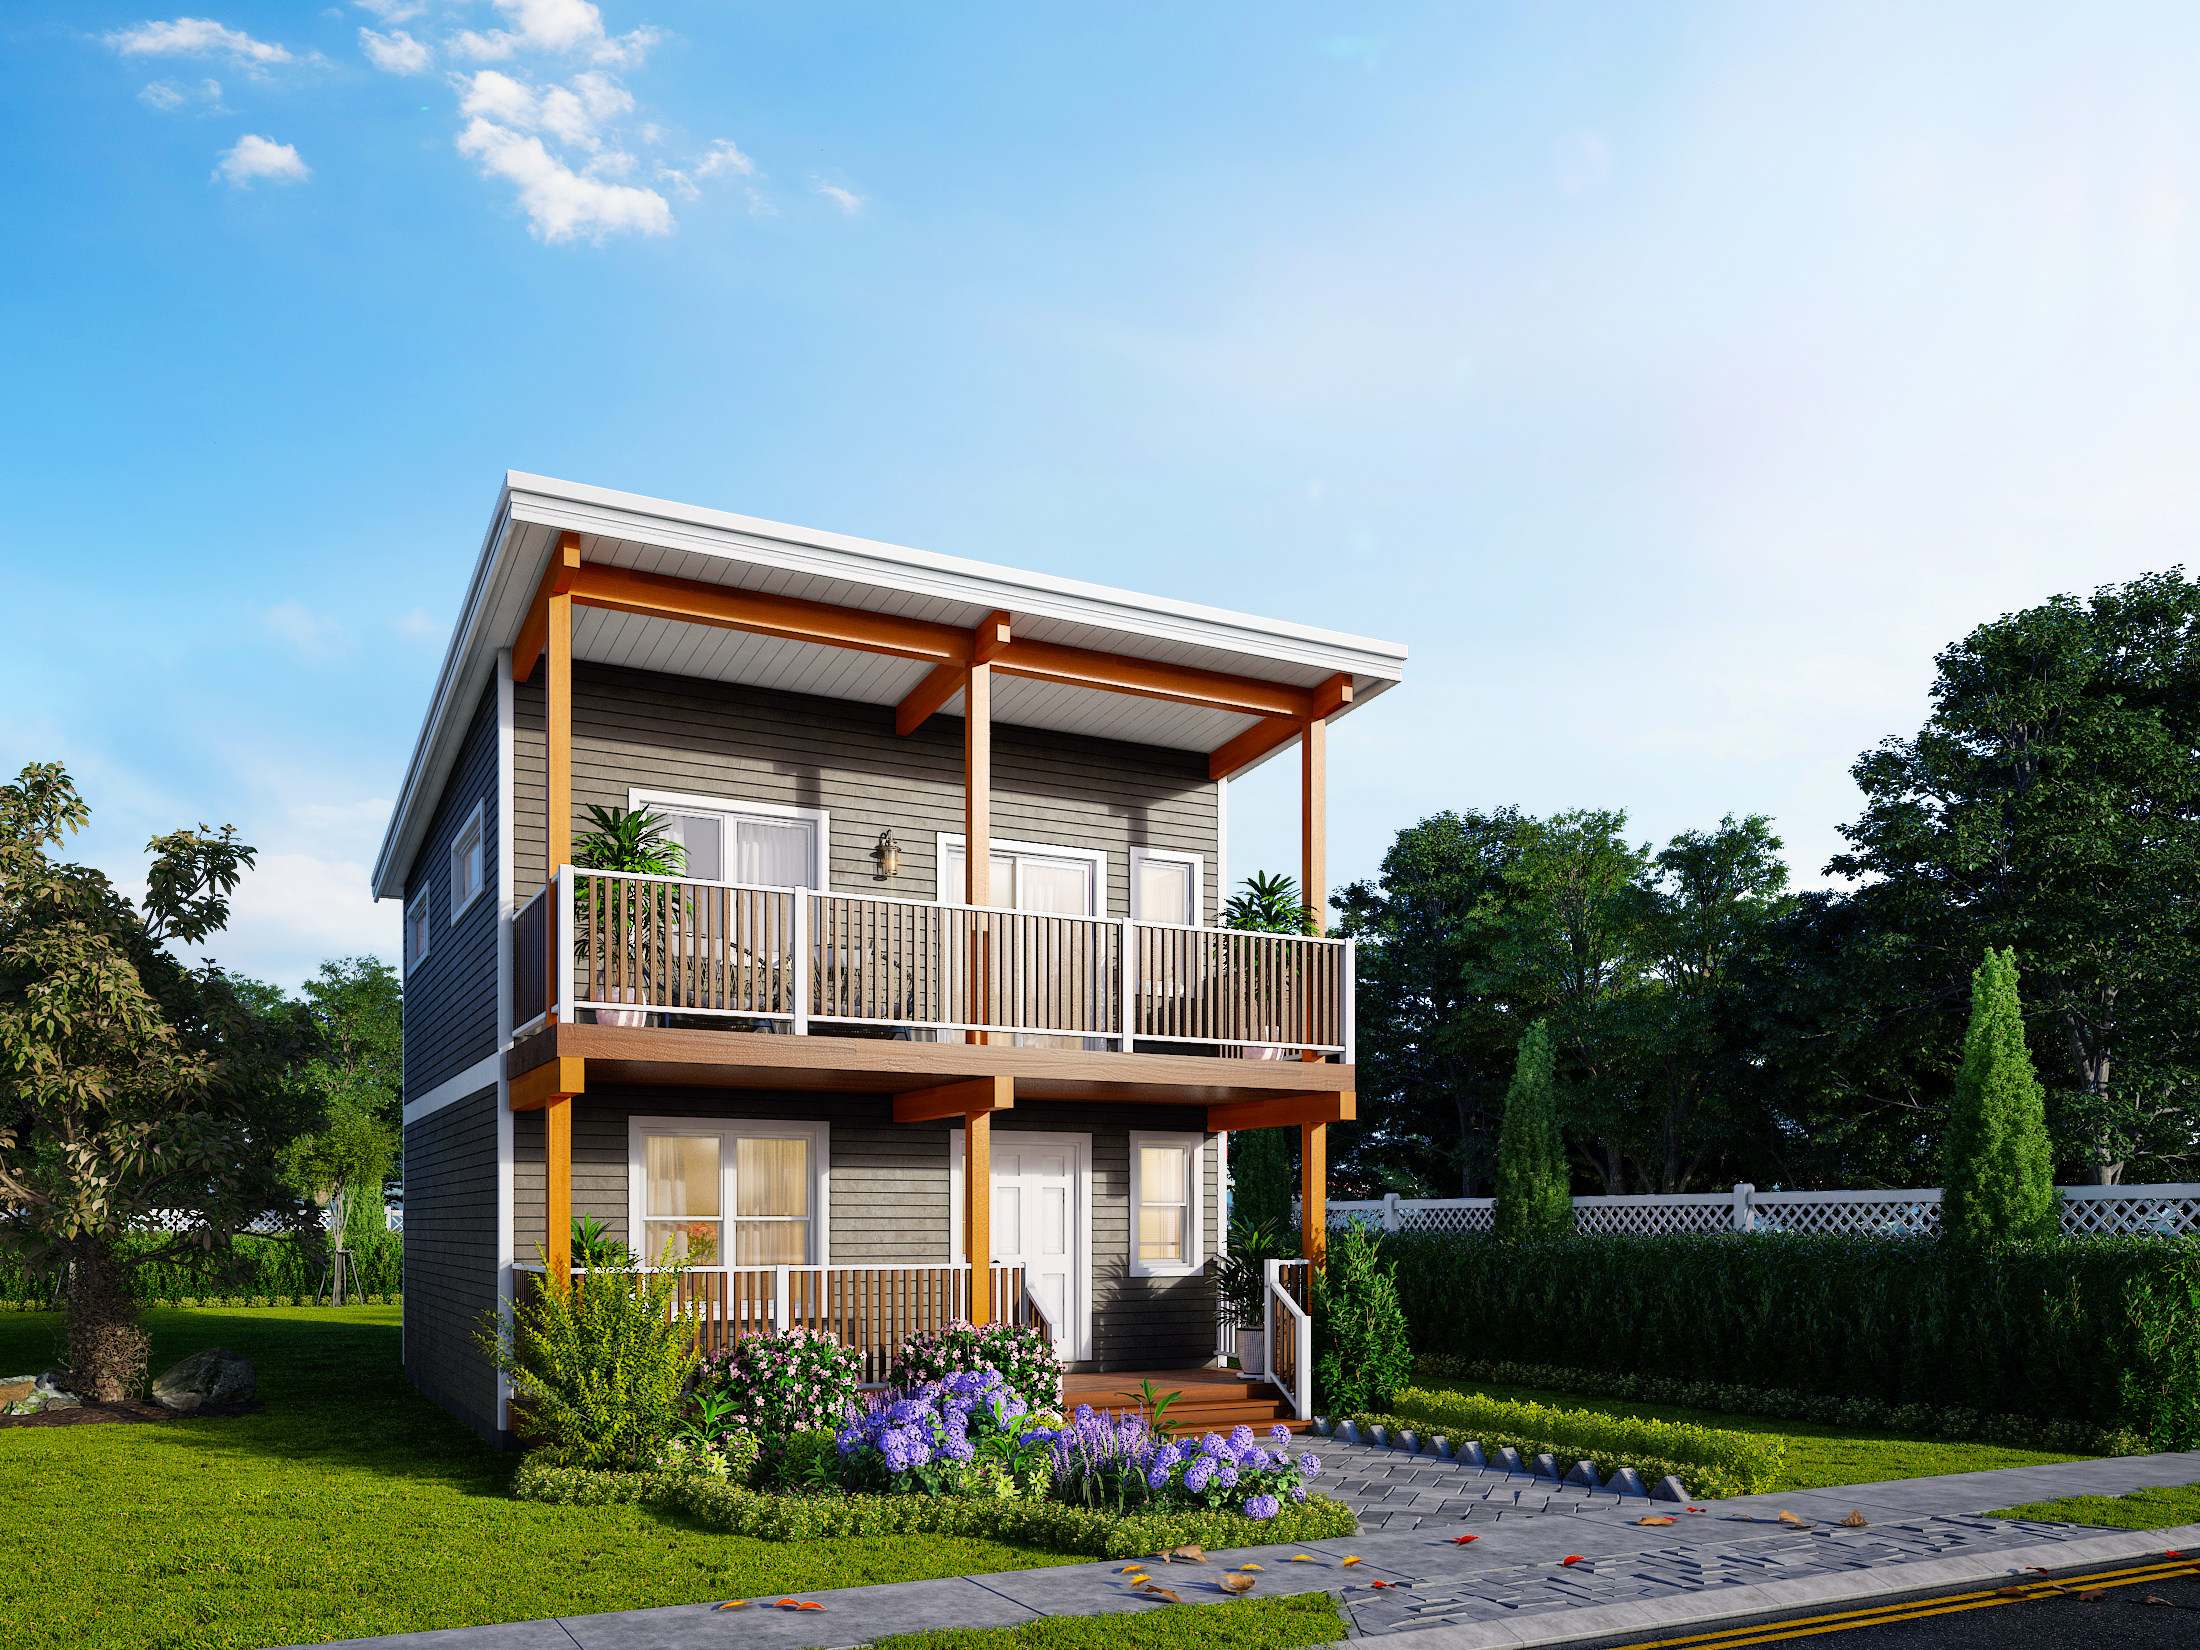 Inspirational Home Plans